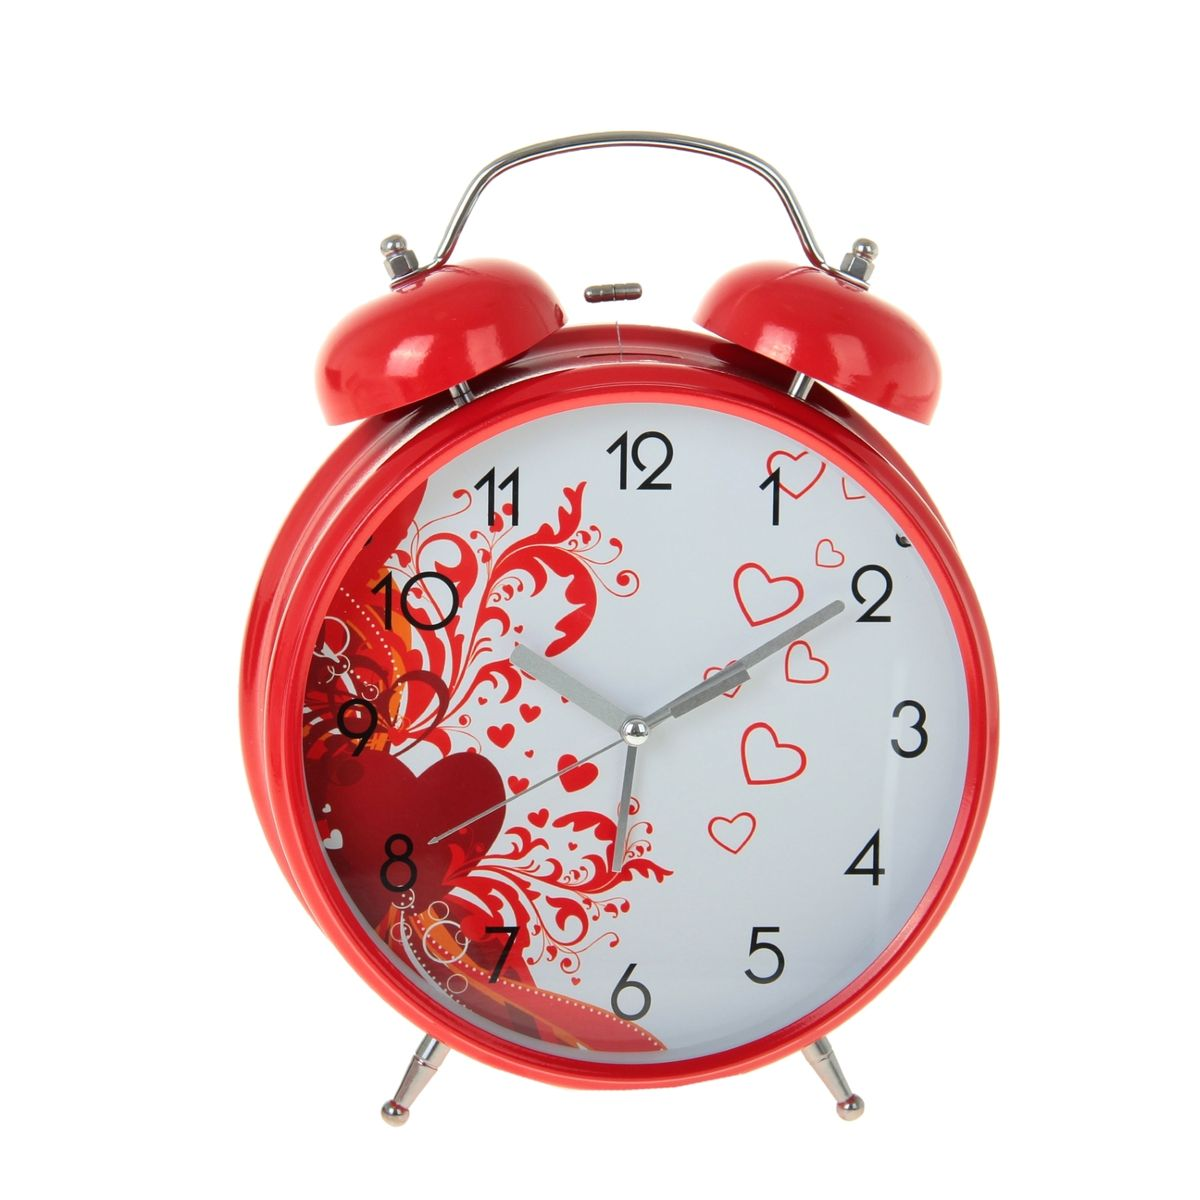 "Часы-будильник Sima-land ""Ажурные сердца"""